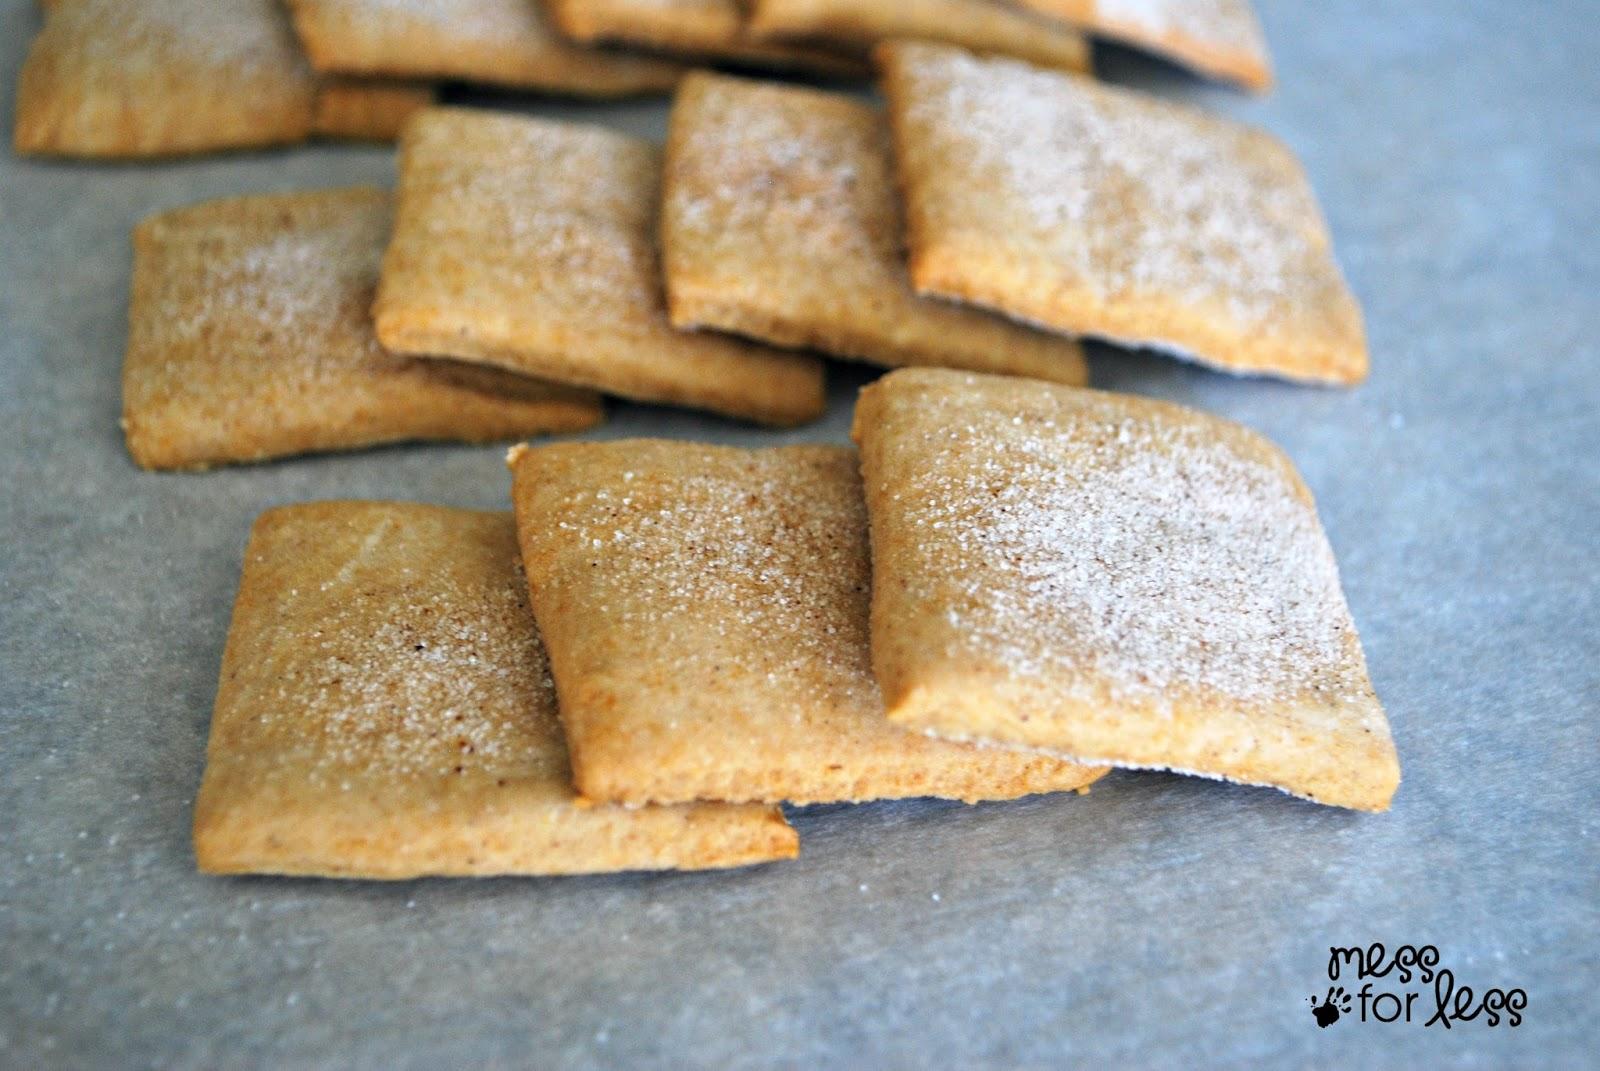 Cinnamon sugar graham crackers